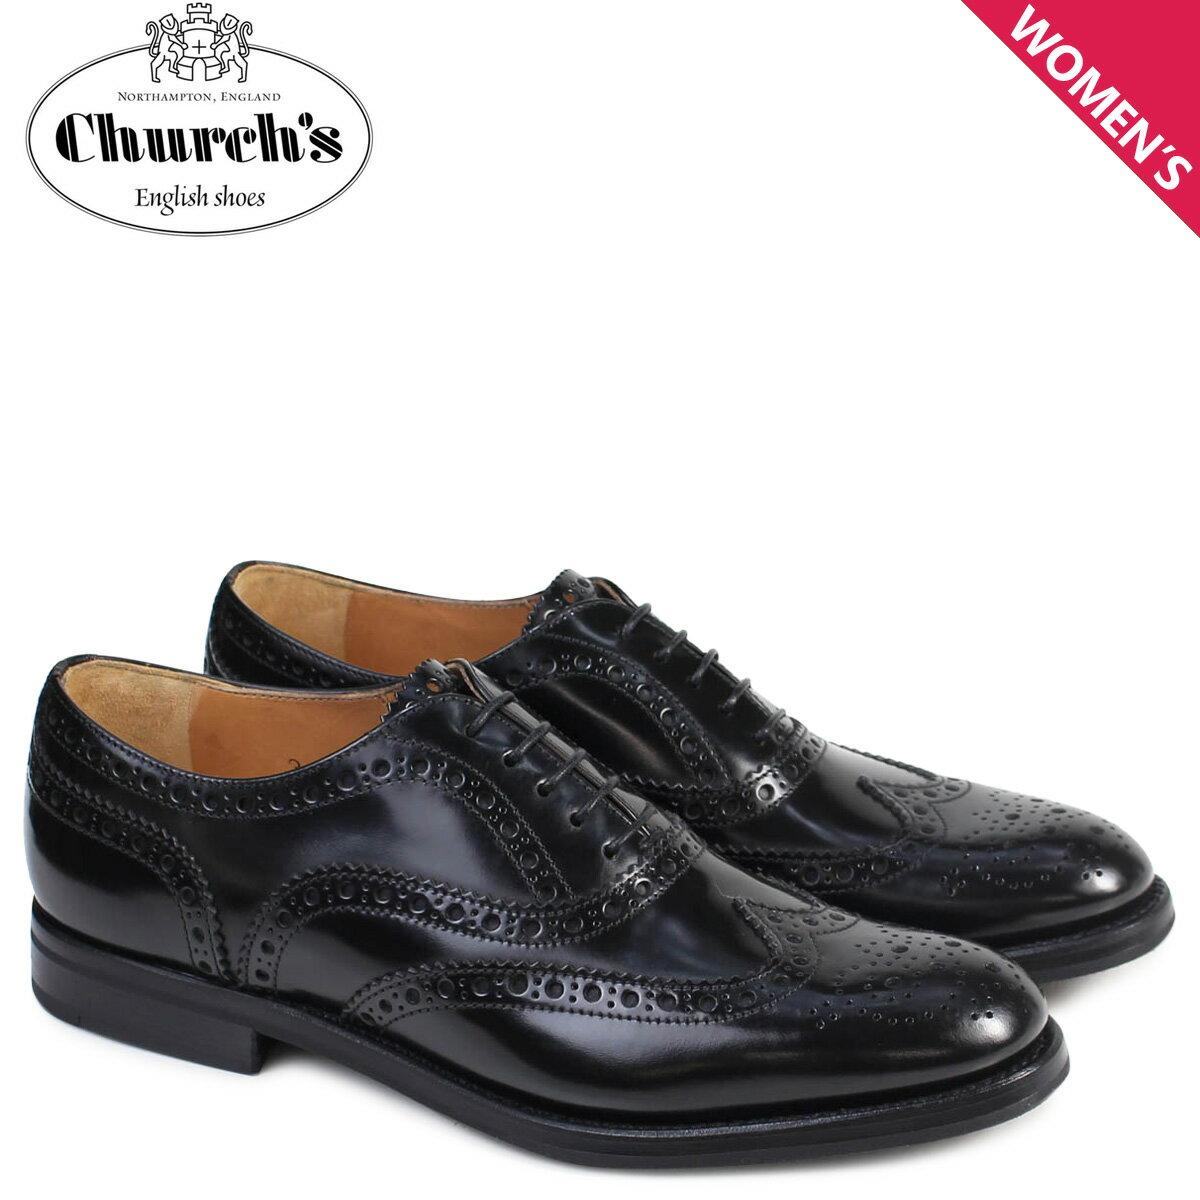 Churchs 靴 レディース チャーチ バーウッド シューズ ウイングチップ Burwood WG Polish Binder Calf 8705 DE0001 ブラック [12/21 再入荷]